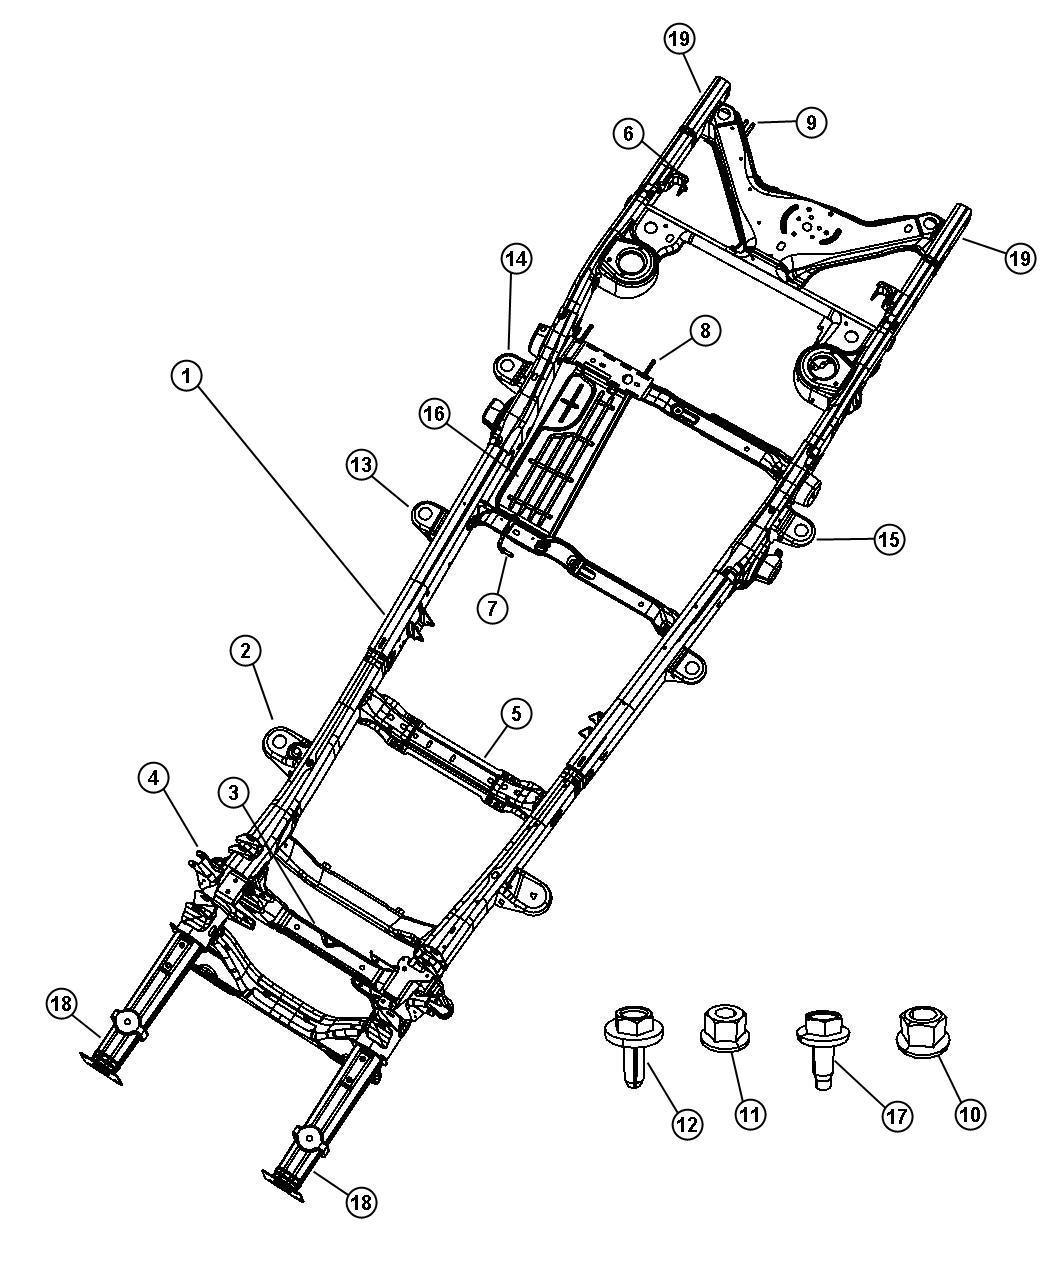 2009 chrysler aspen crossmember underbody lower control. Black Bedroom Furniture Sets. Home Design Ideas